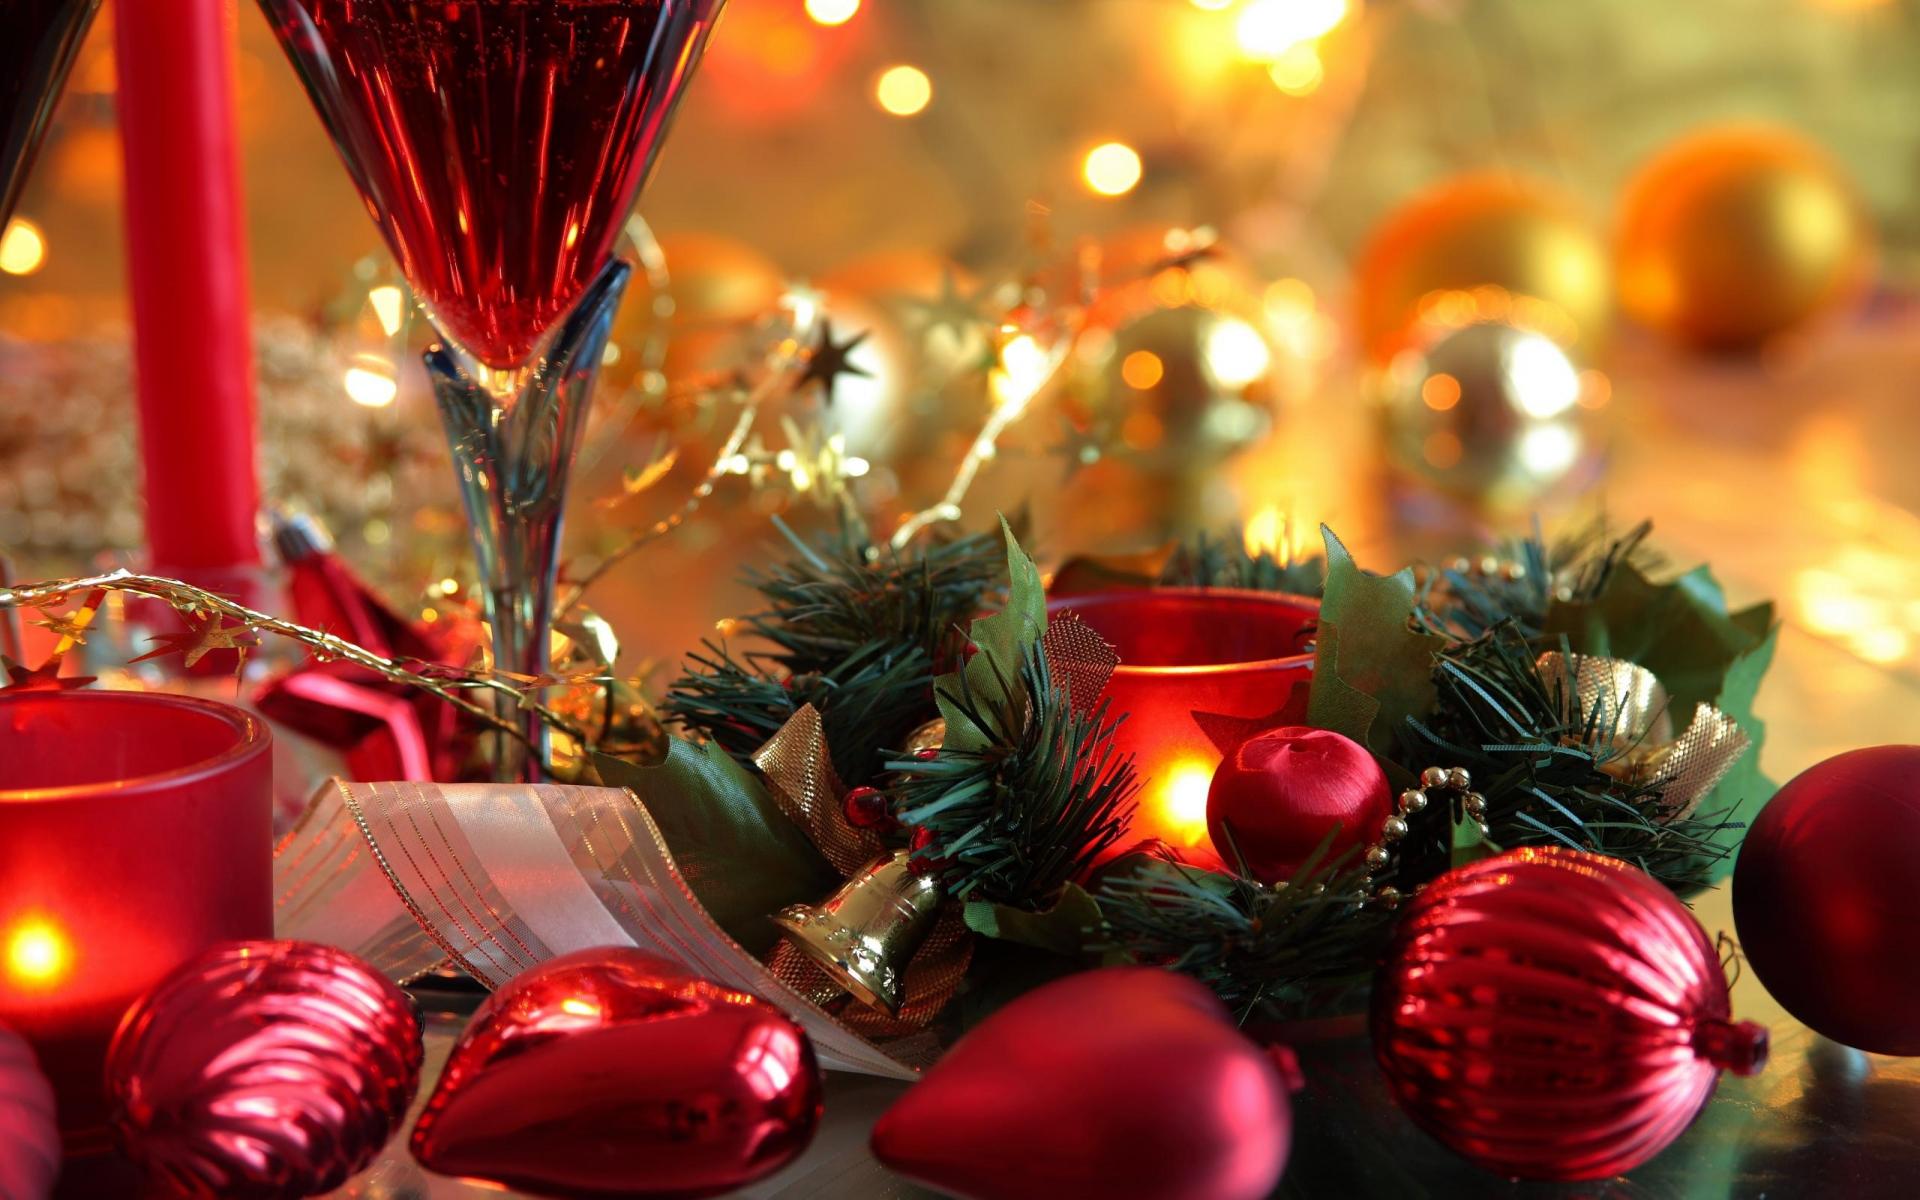 Holidays christmas seasonal festive wallpaper | 1920x1200 ...